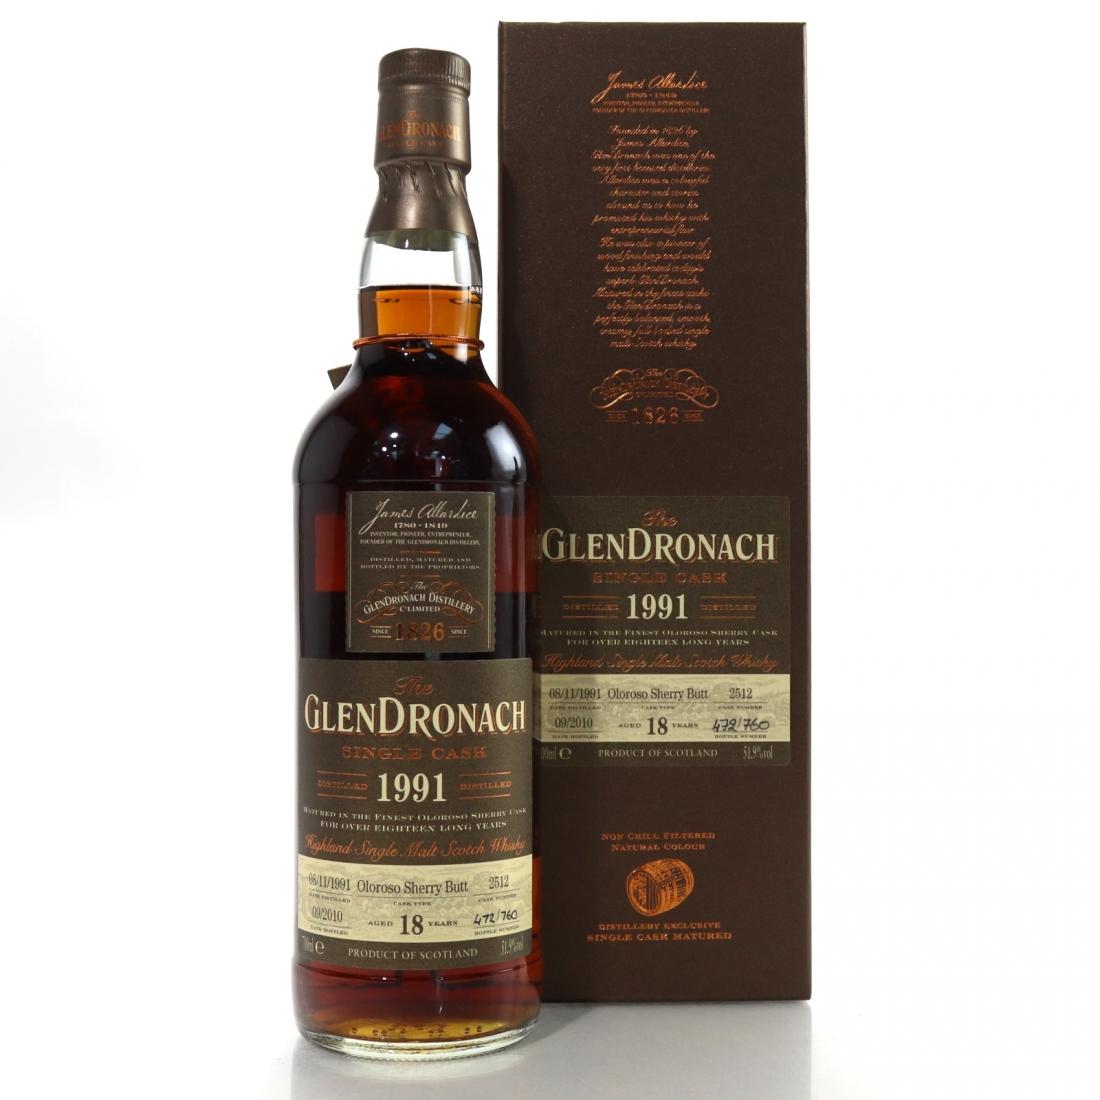 Glendronach 1991 Single Cask 18 Year Old #2512